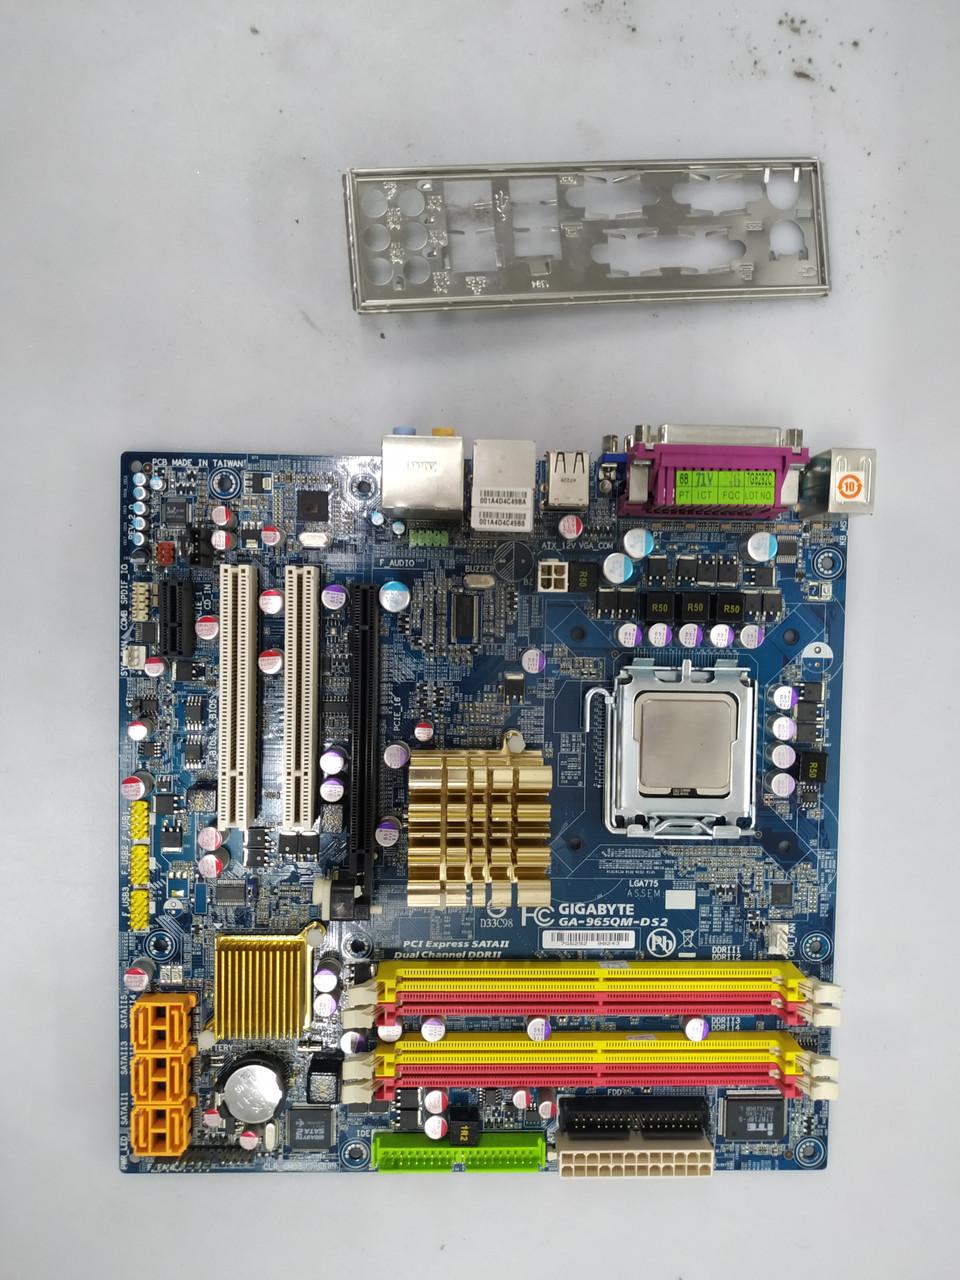 Материнская плата Gigabyte GA-965QM-DS2 (s775, Q965, PCI-Ex16) и процессор двухъядерный